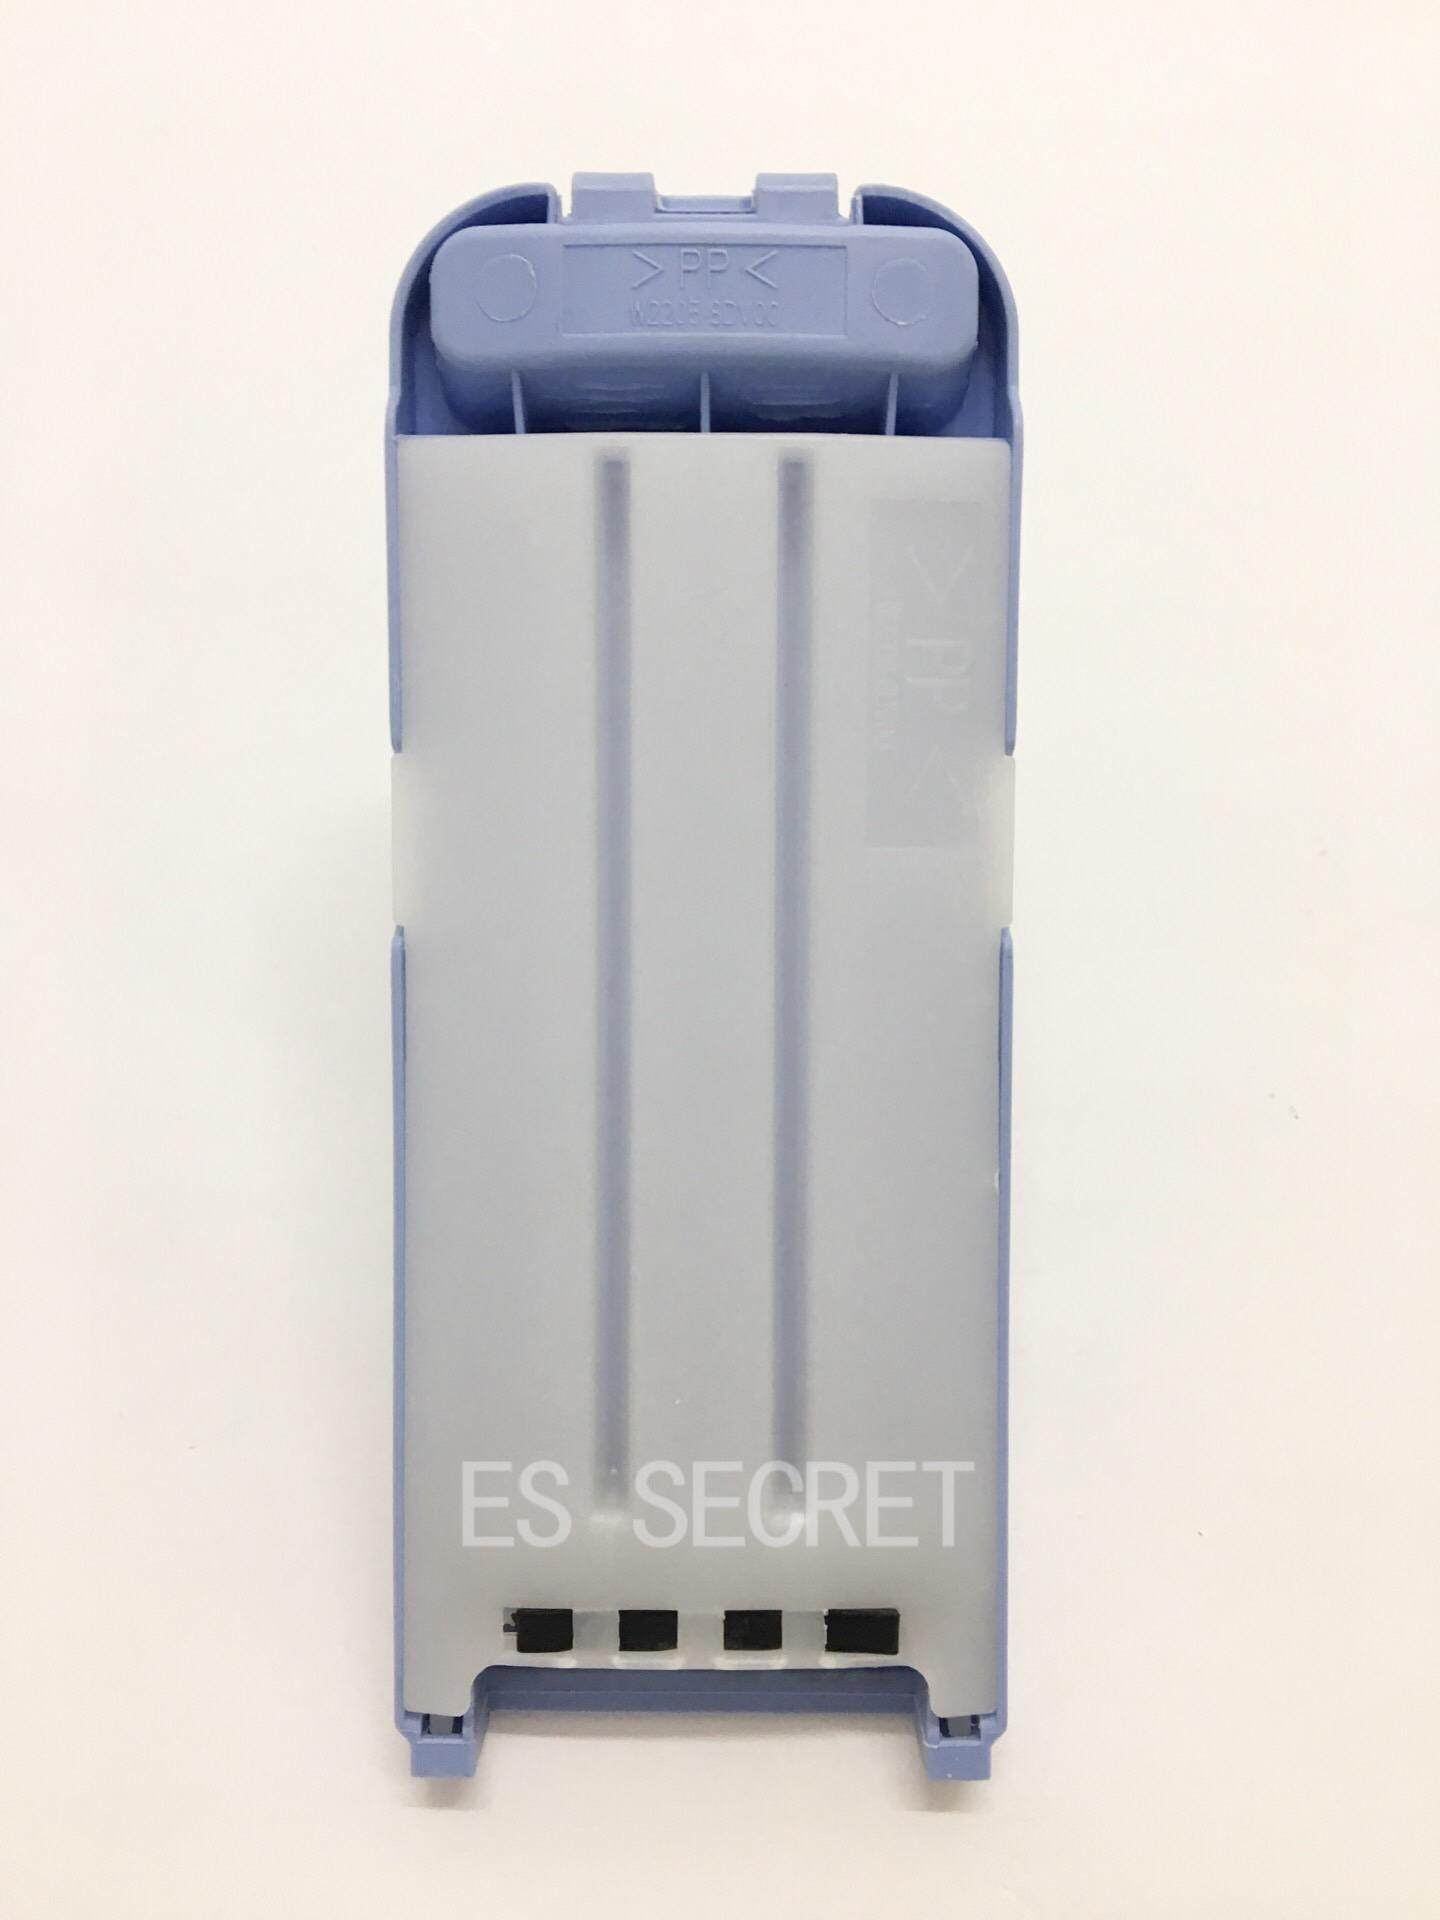 Panasonic Washing machine Dust Filter Original NA-F70B3 / NA-F75B3 / NA-F70S7 / NA-F70H3